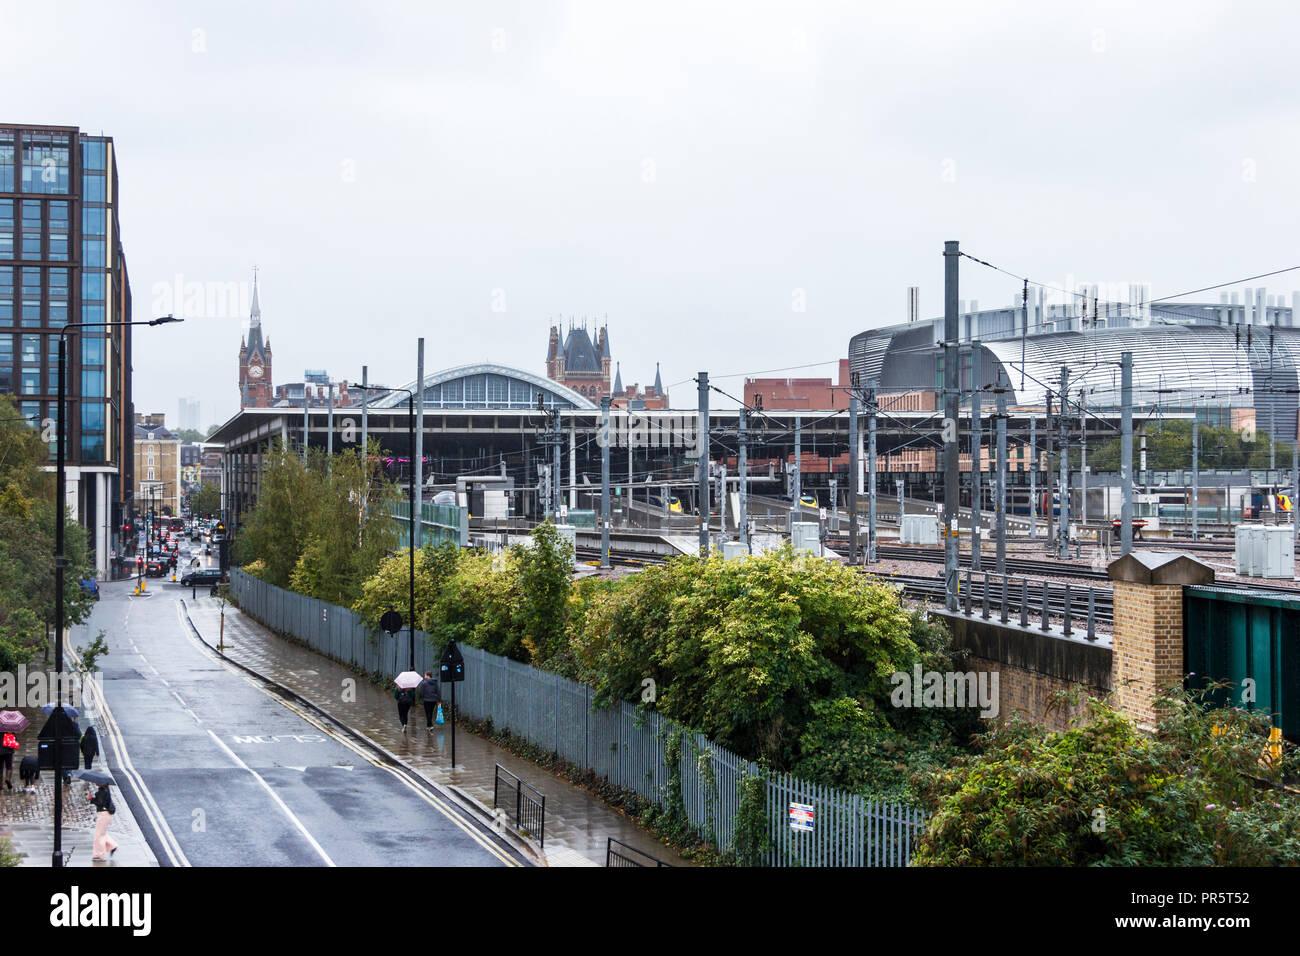 The railway line out of St. Pancras International railway station, London, UK, 2018 - Stock Image